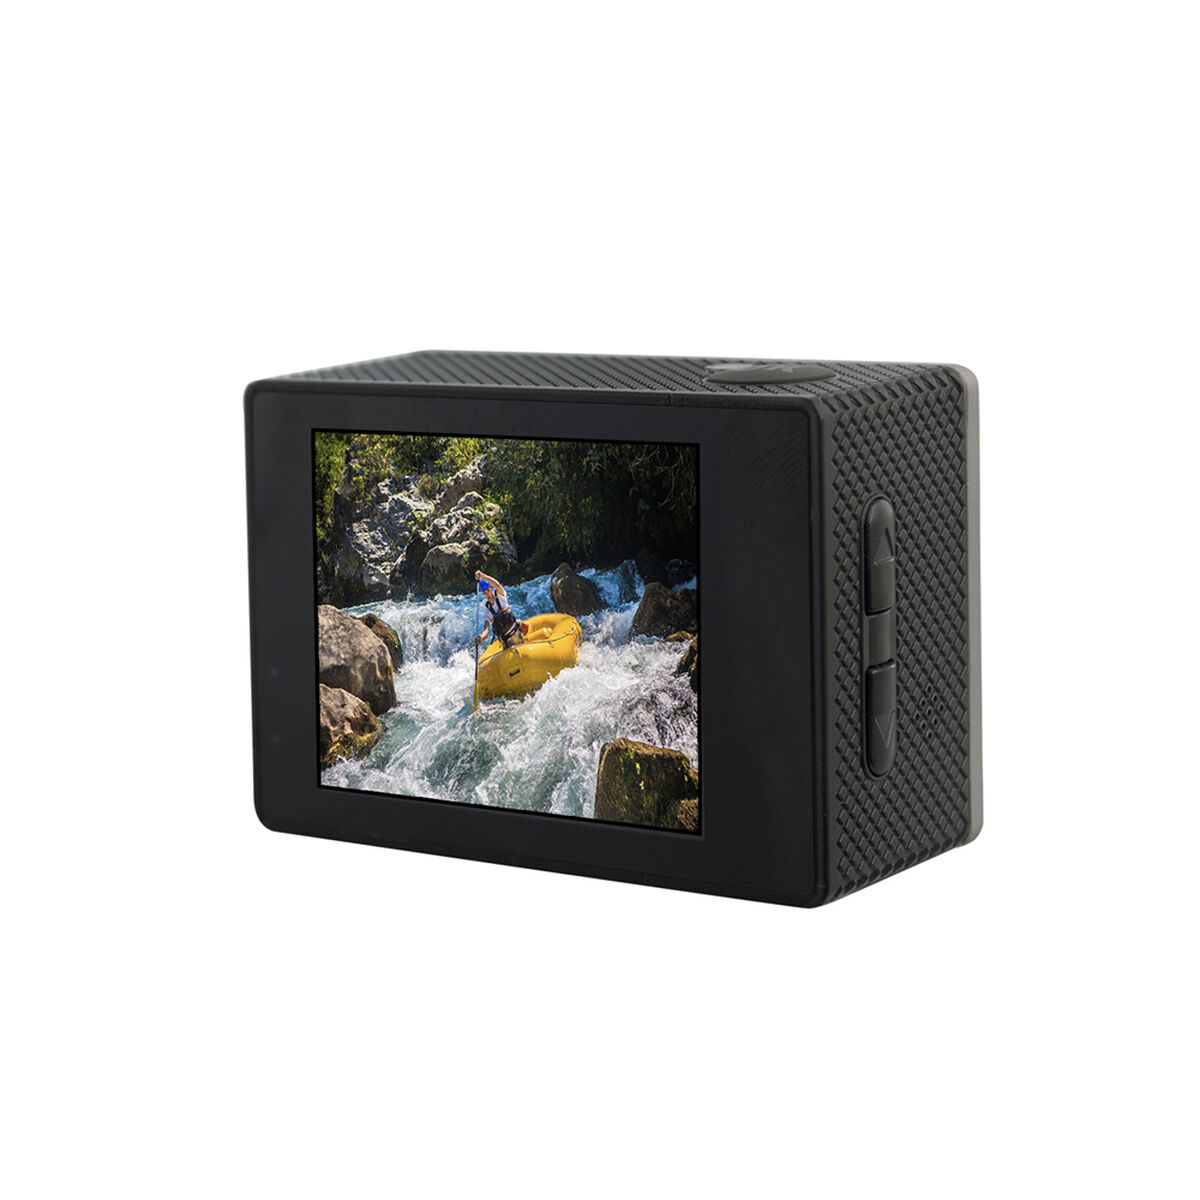 Cámara Deportiva Microlab iSport Pro Cam HD Amarilla + Batería Externa Portátil